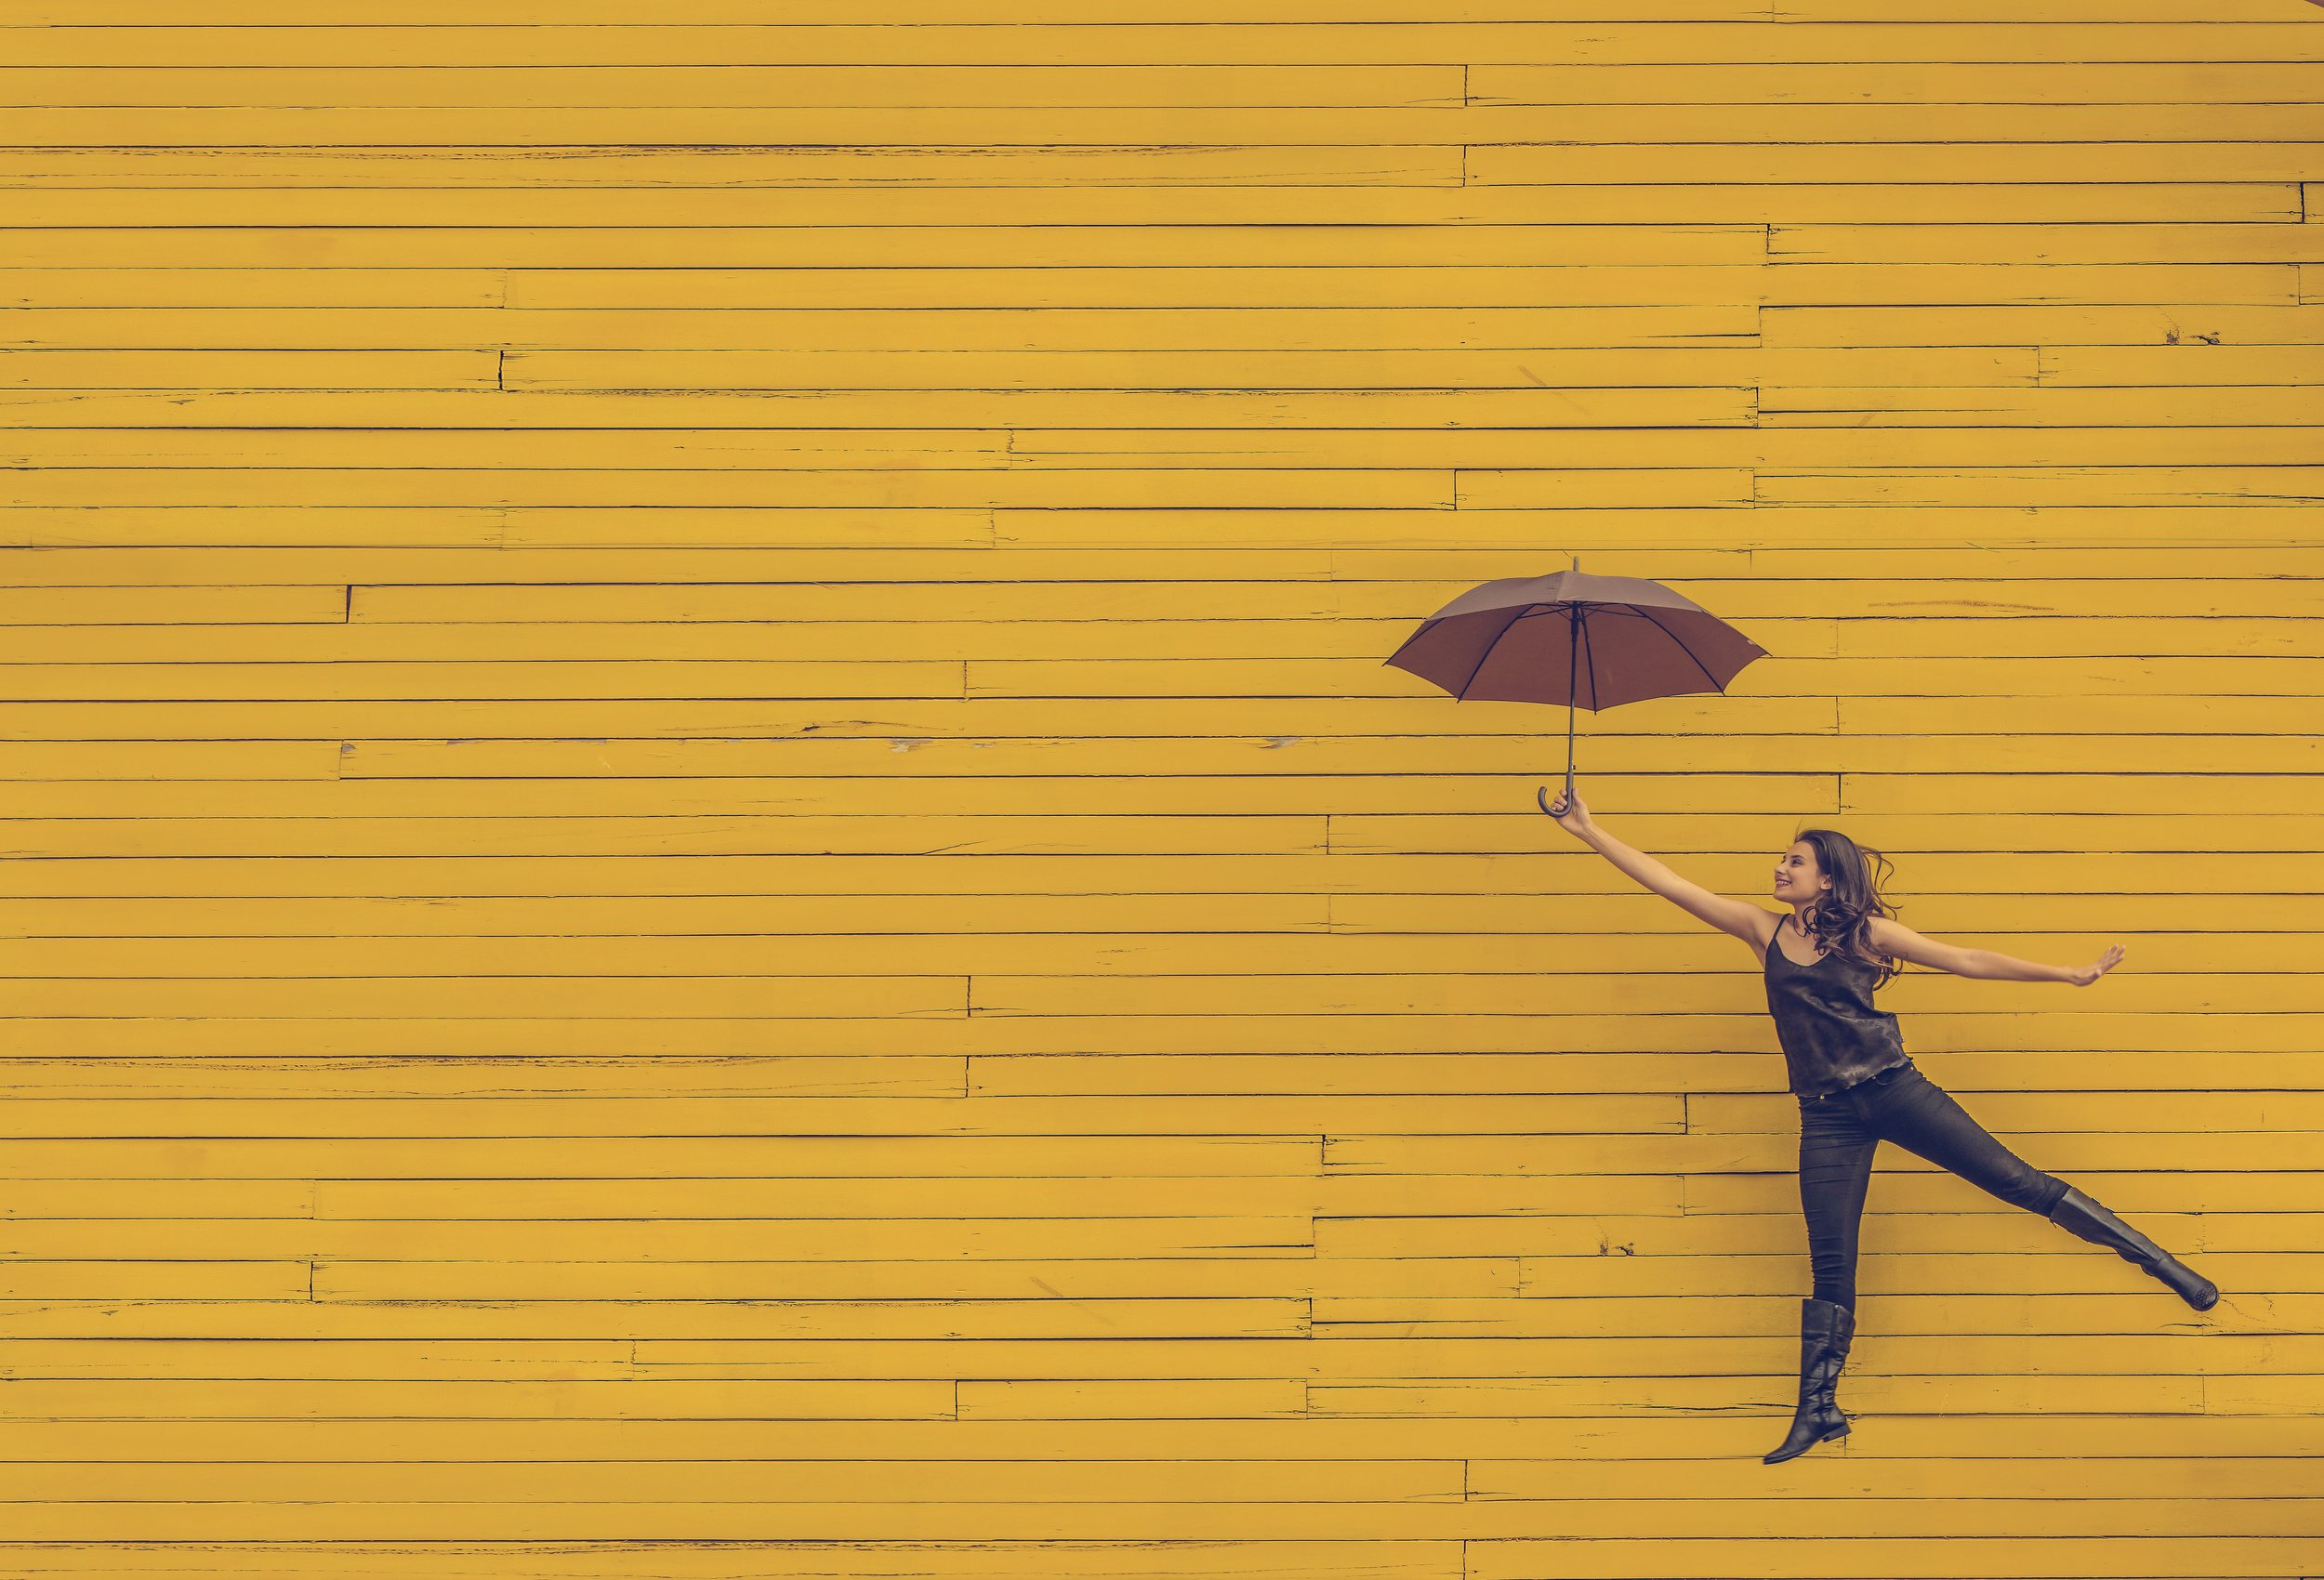 edu-lauton-woman-umbrella-floating.jpg